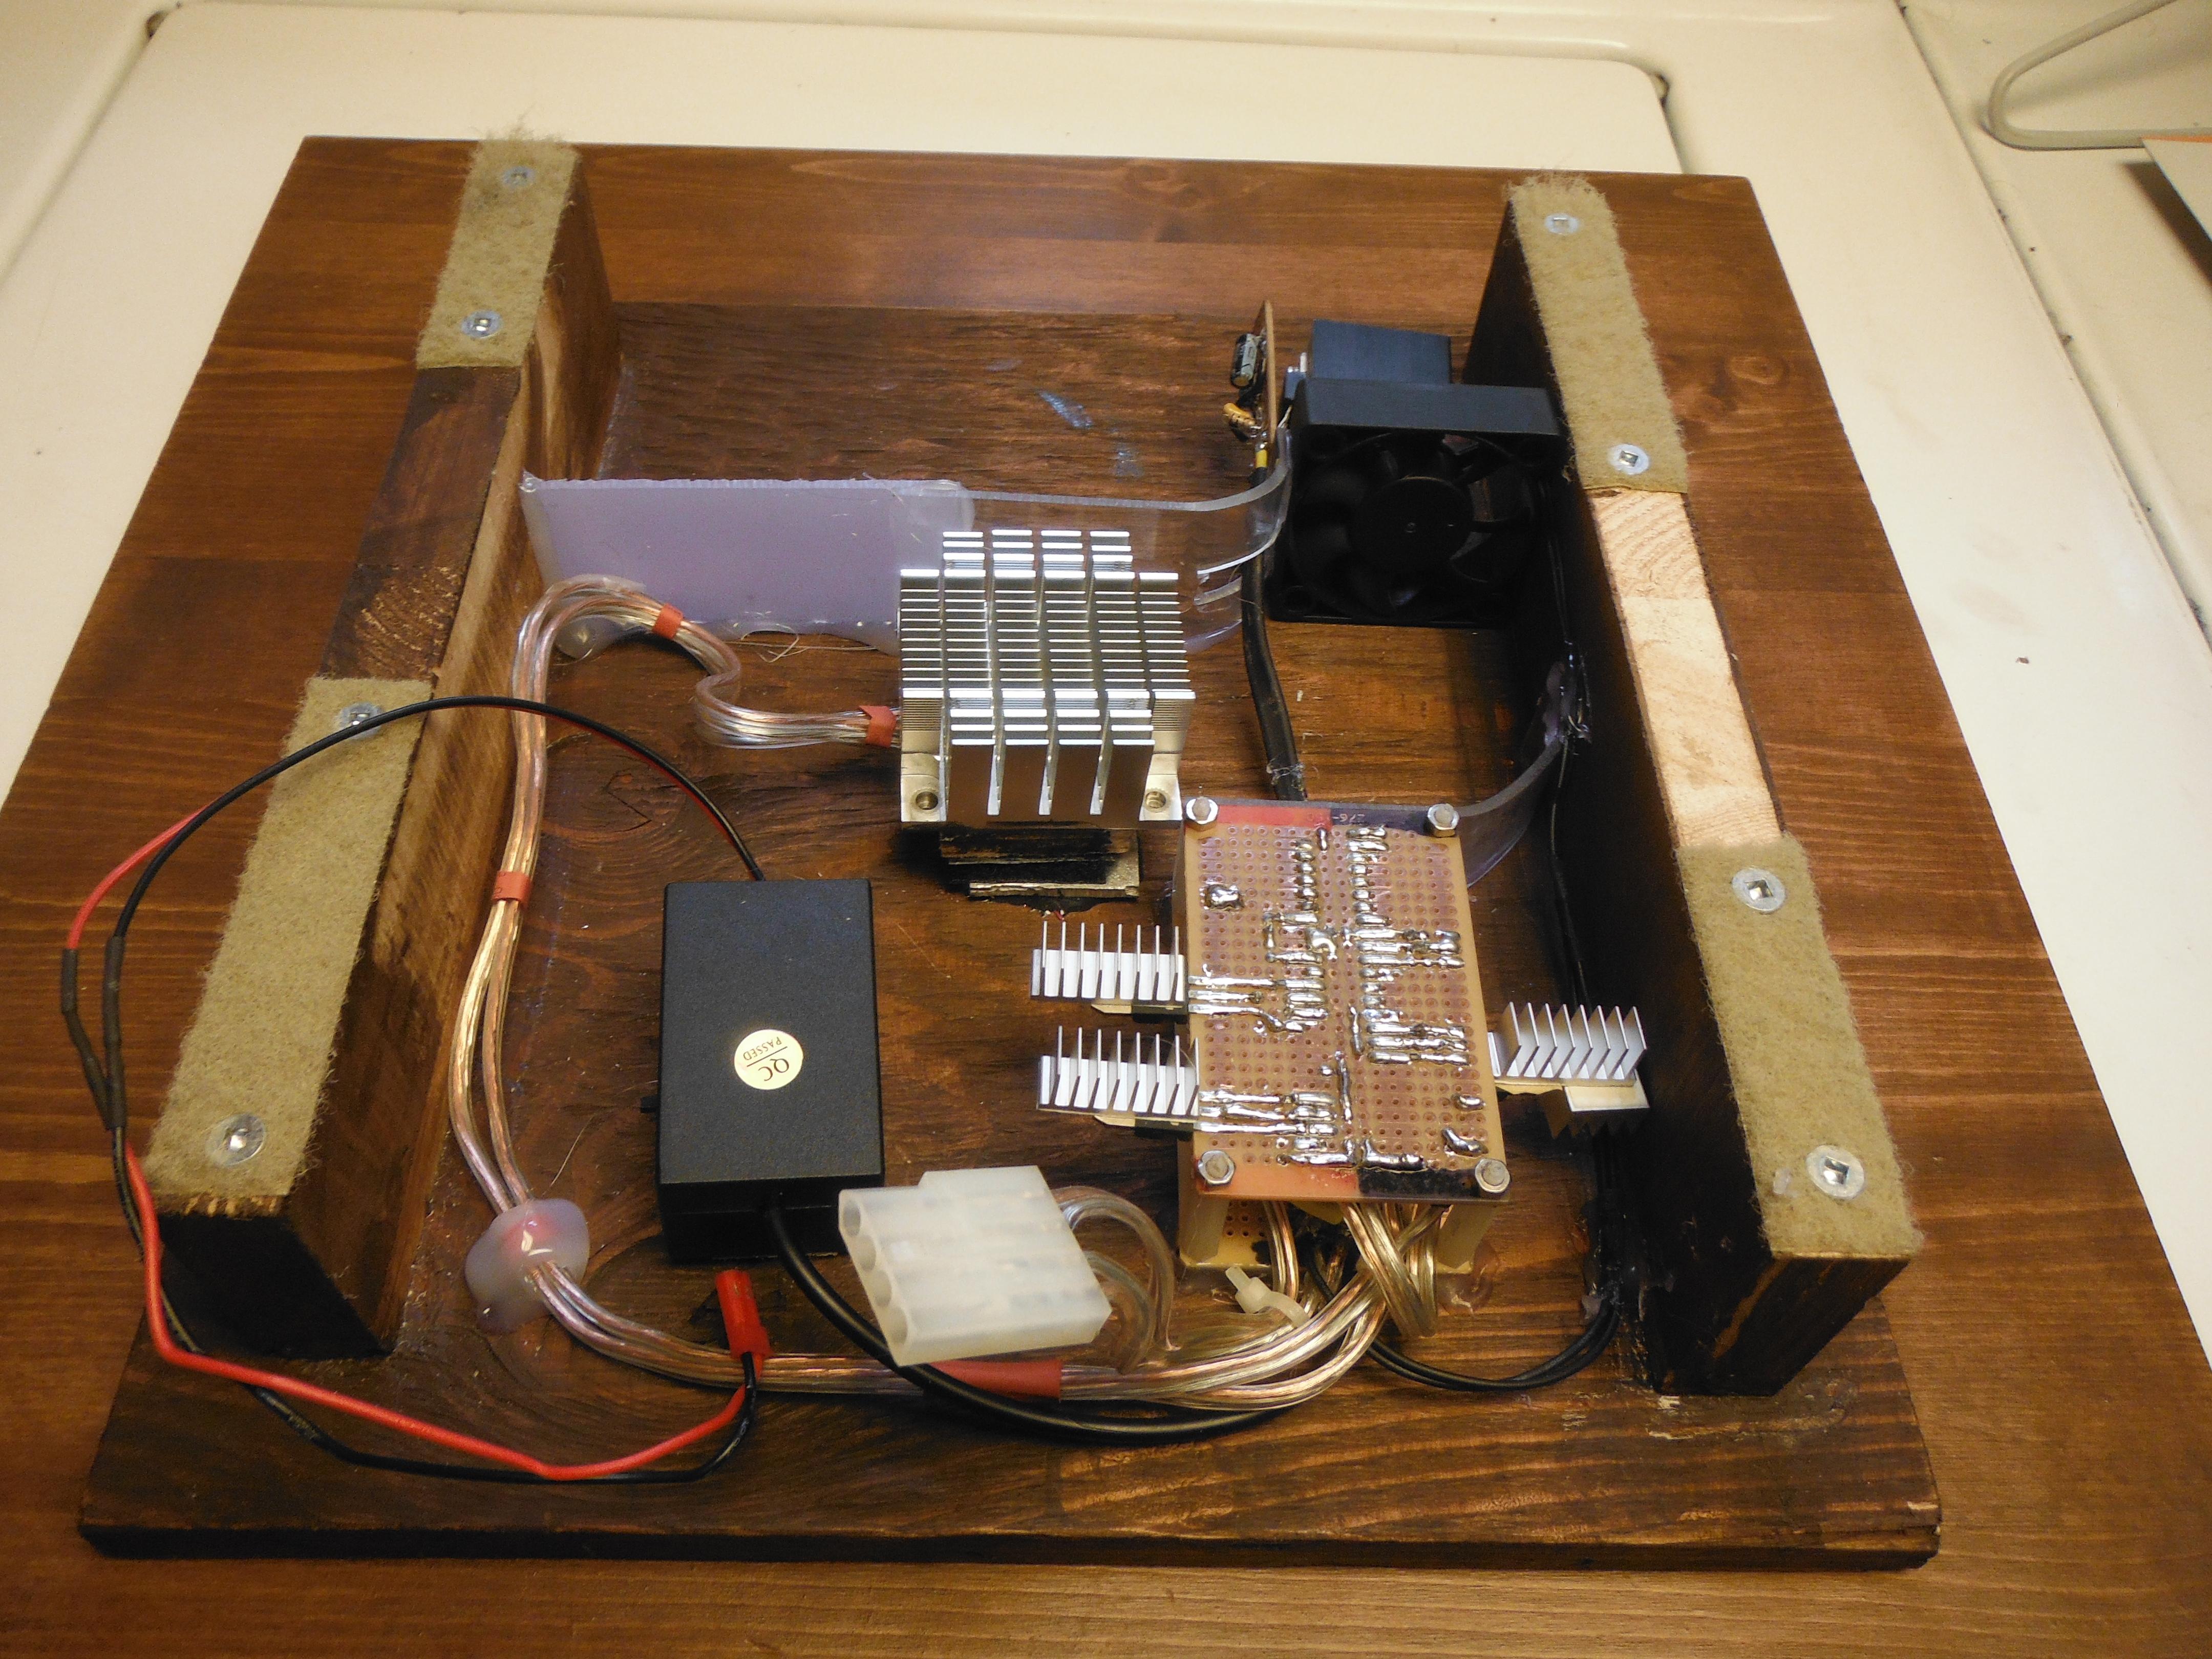 Picture of Fiber-Optics and Final Electronics